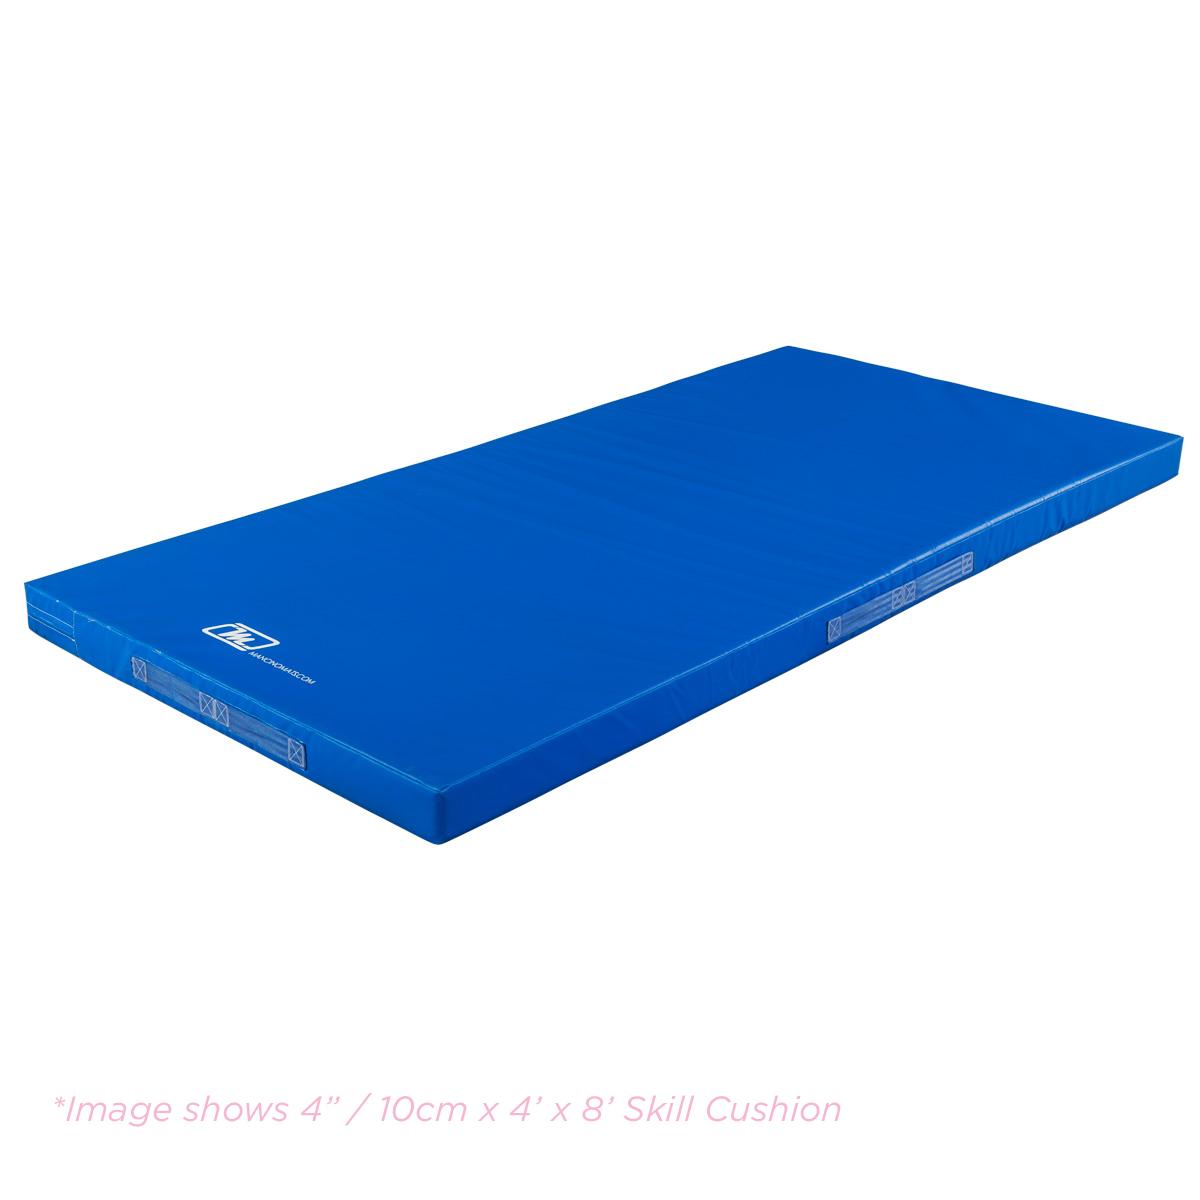 "4"" incher skill cushion landing mat in royal blue"